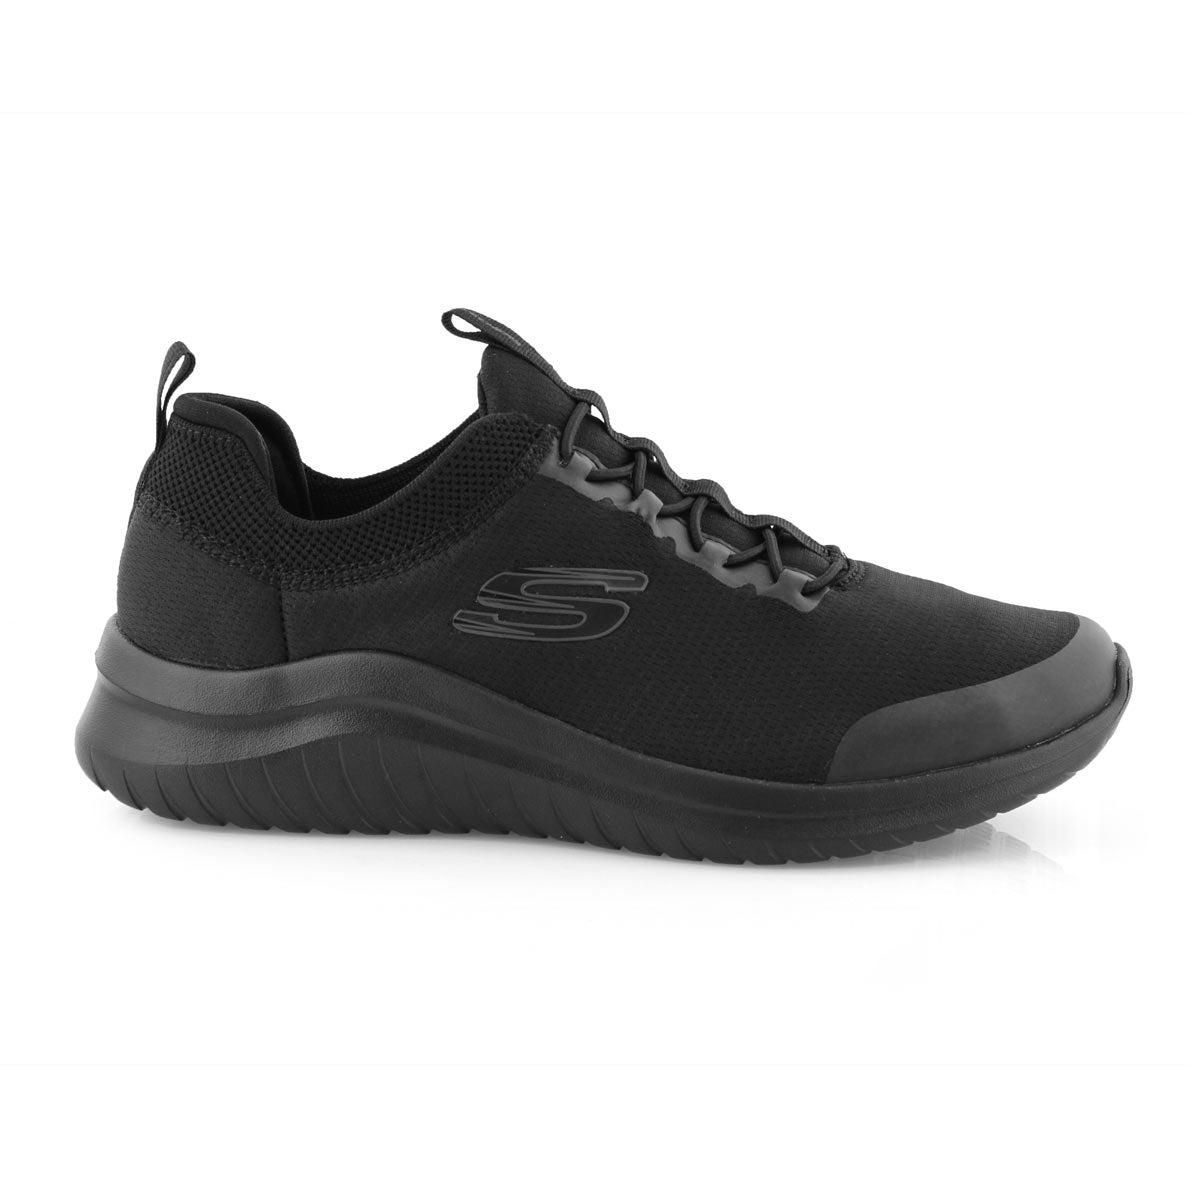 Mns Ultra Flex 2.0 black slip on sneaker